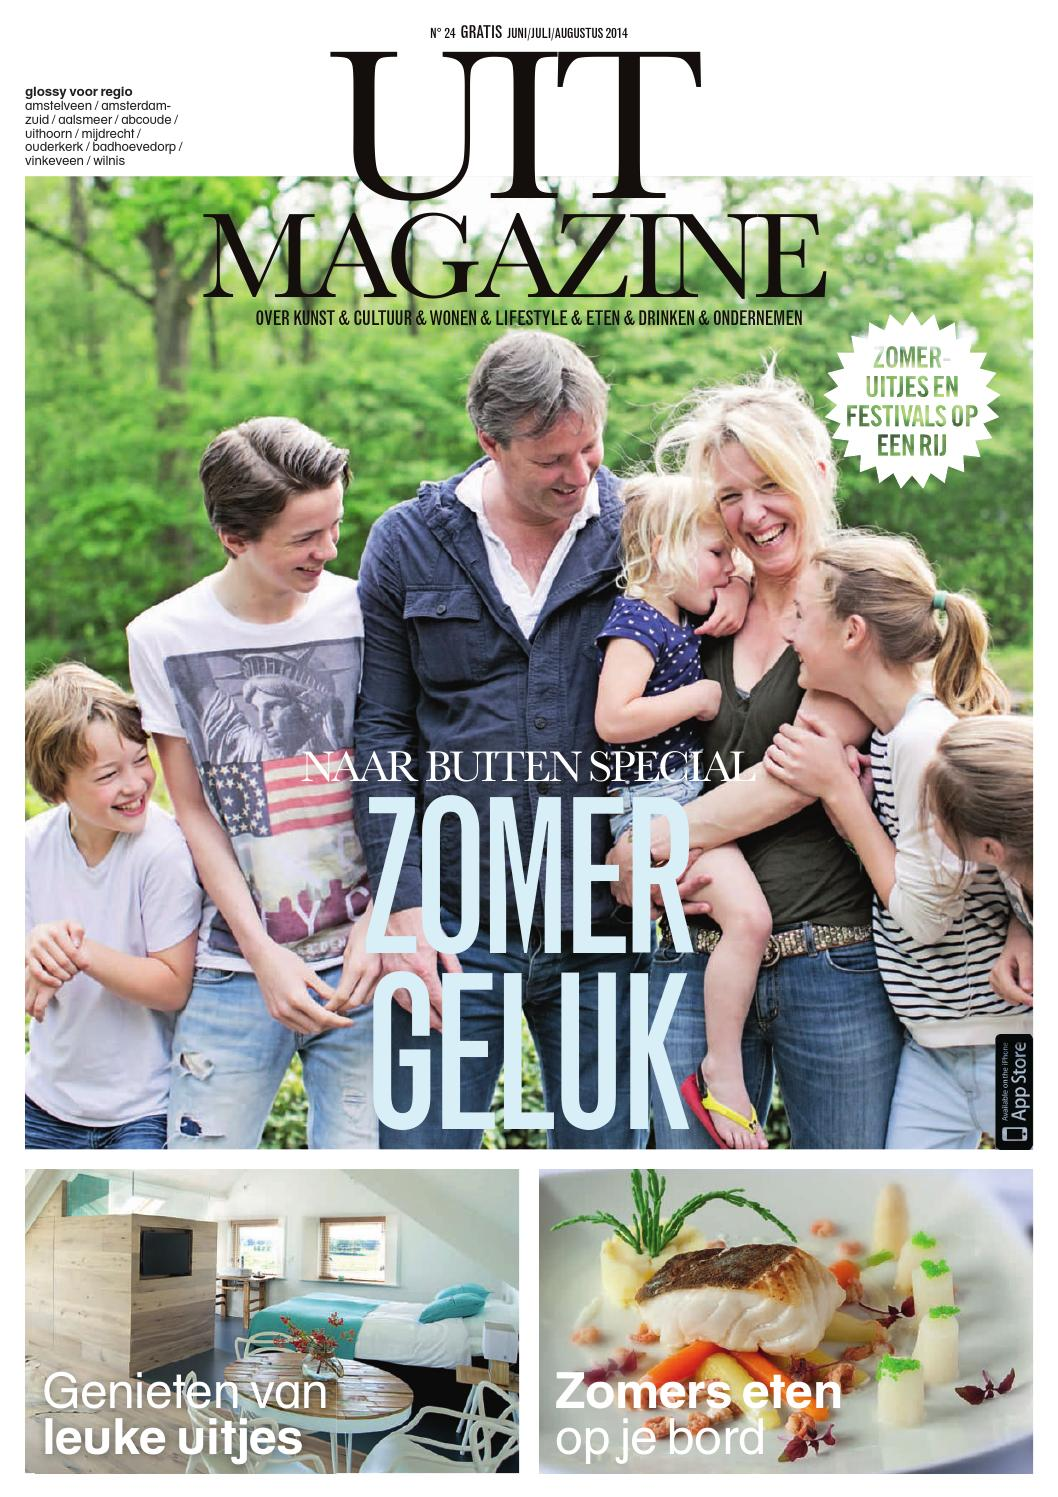 Uitmagazine nr 20 by uitmagazine   issuu